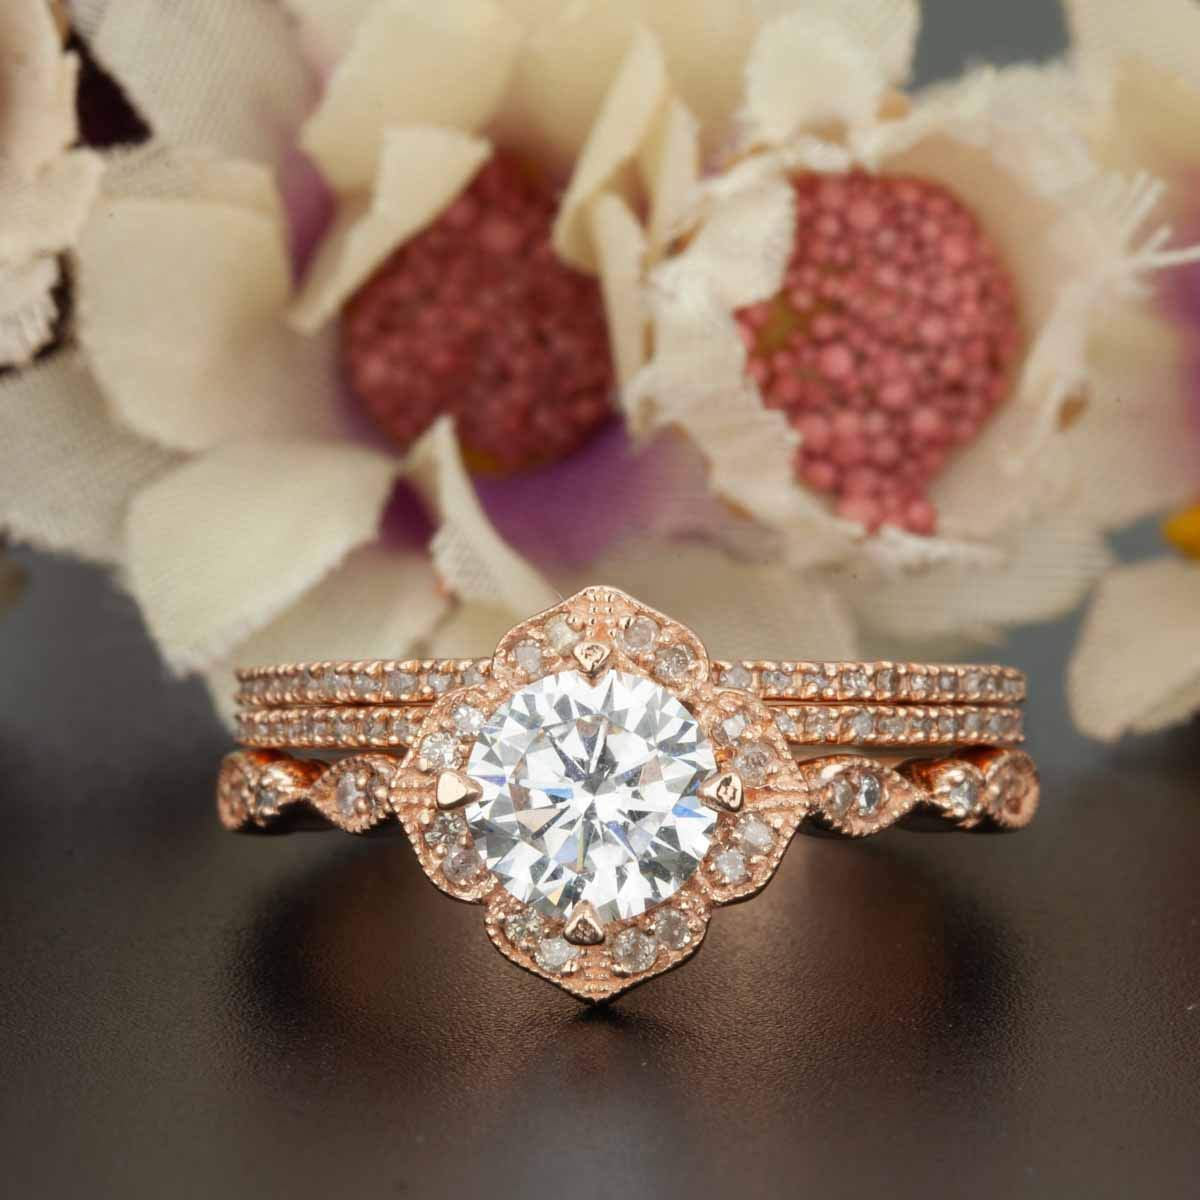 Cheap Antique Wedding Ring Find Antique Wedding Ring Deals